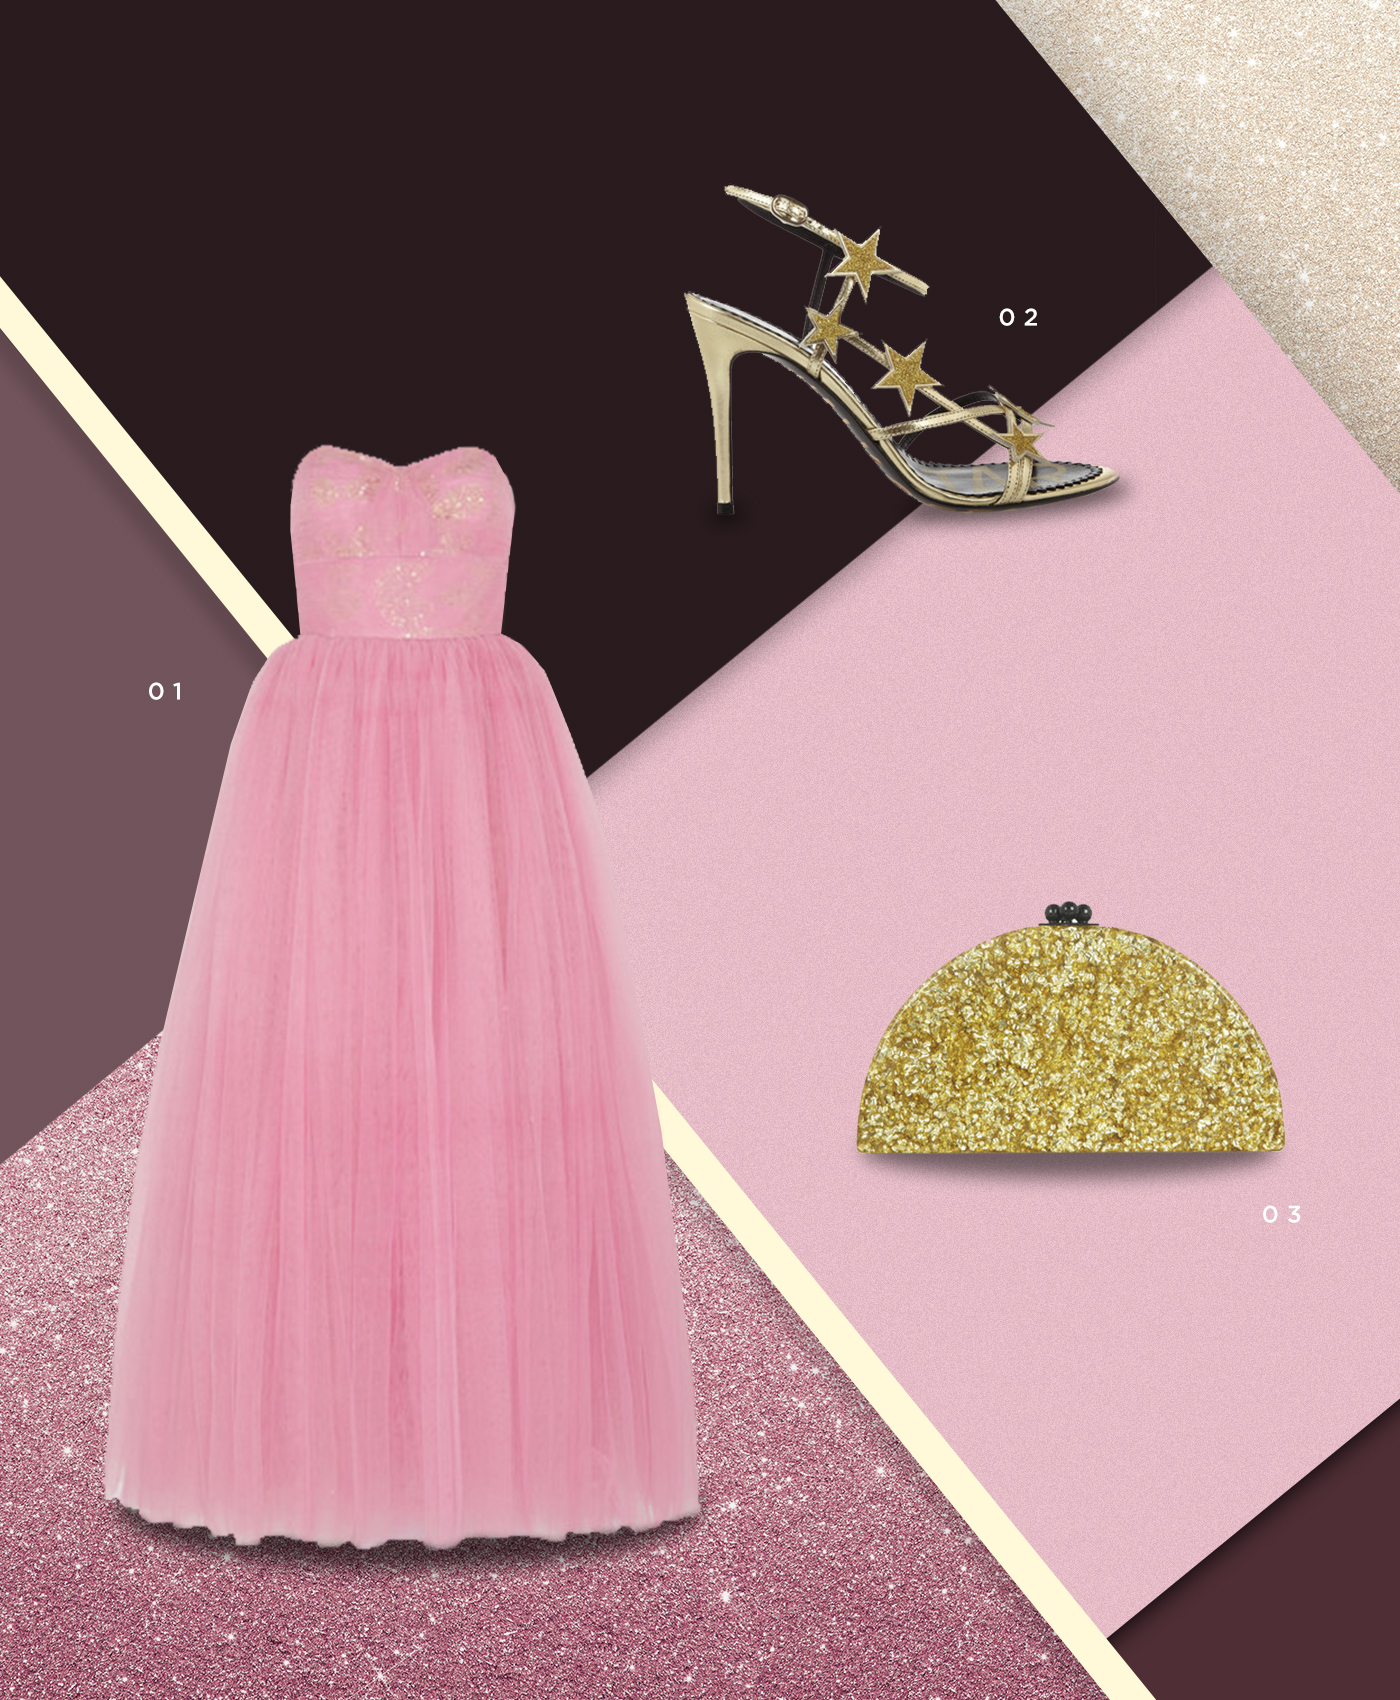 Maison-Mitteg-Looks-Gown-Ashish-Redvalentino-Edie-Parker